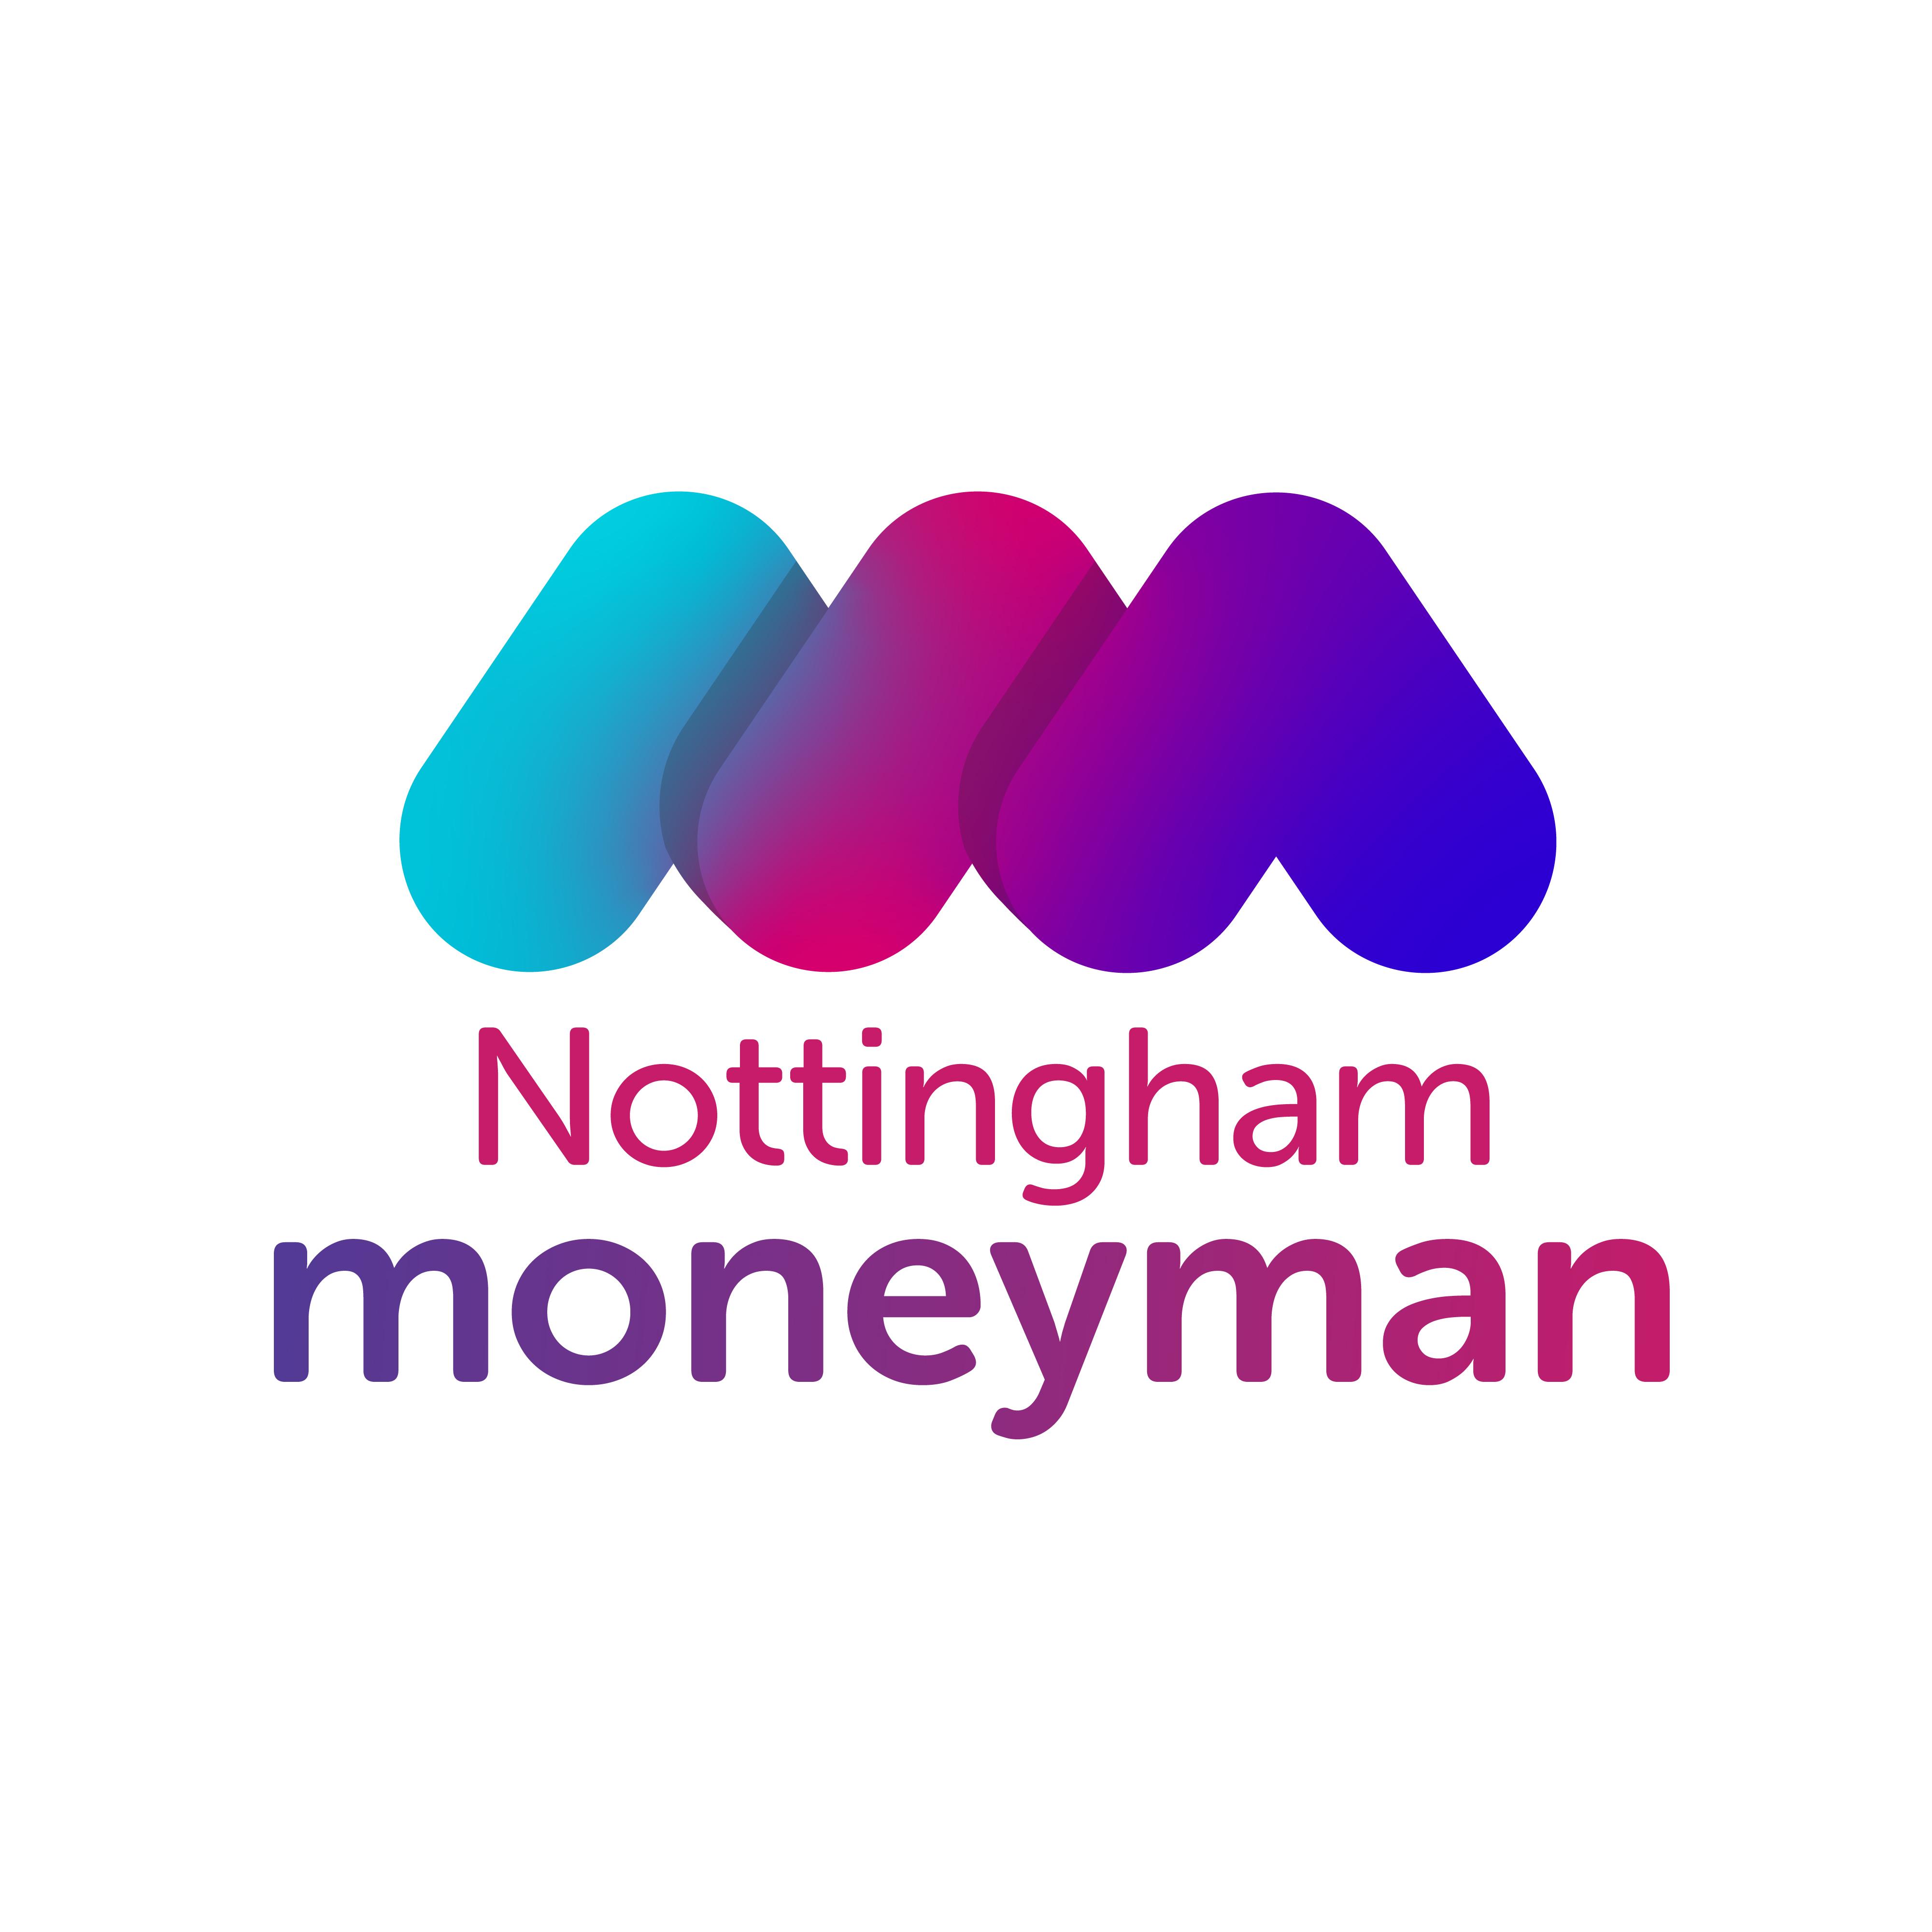 Read Nottinghammoneyman - Mortgage Brokers Reviews